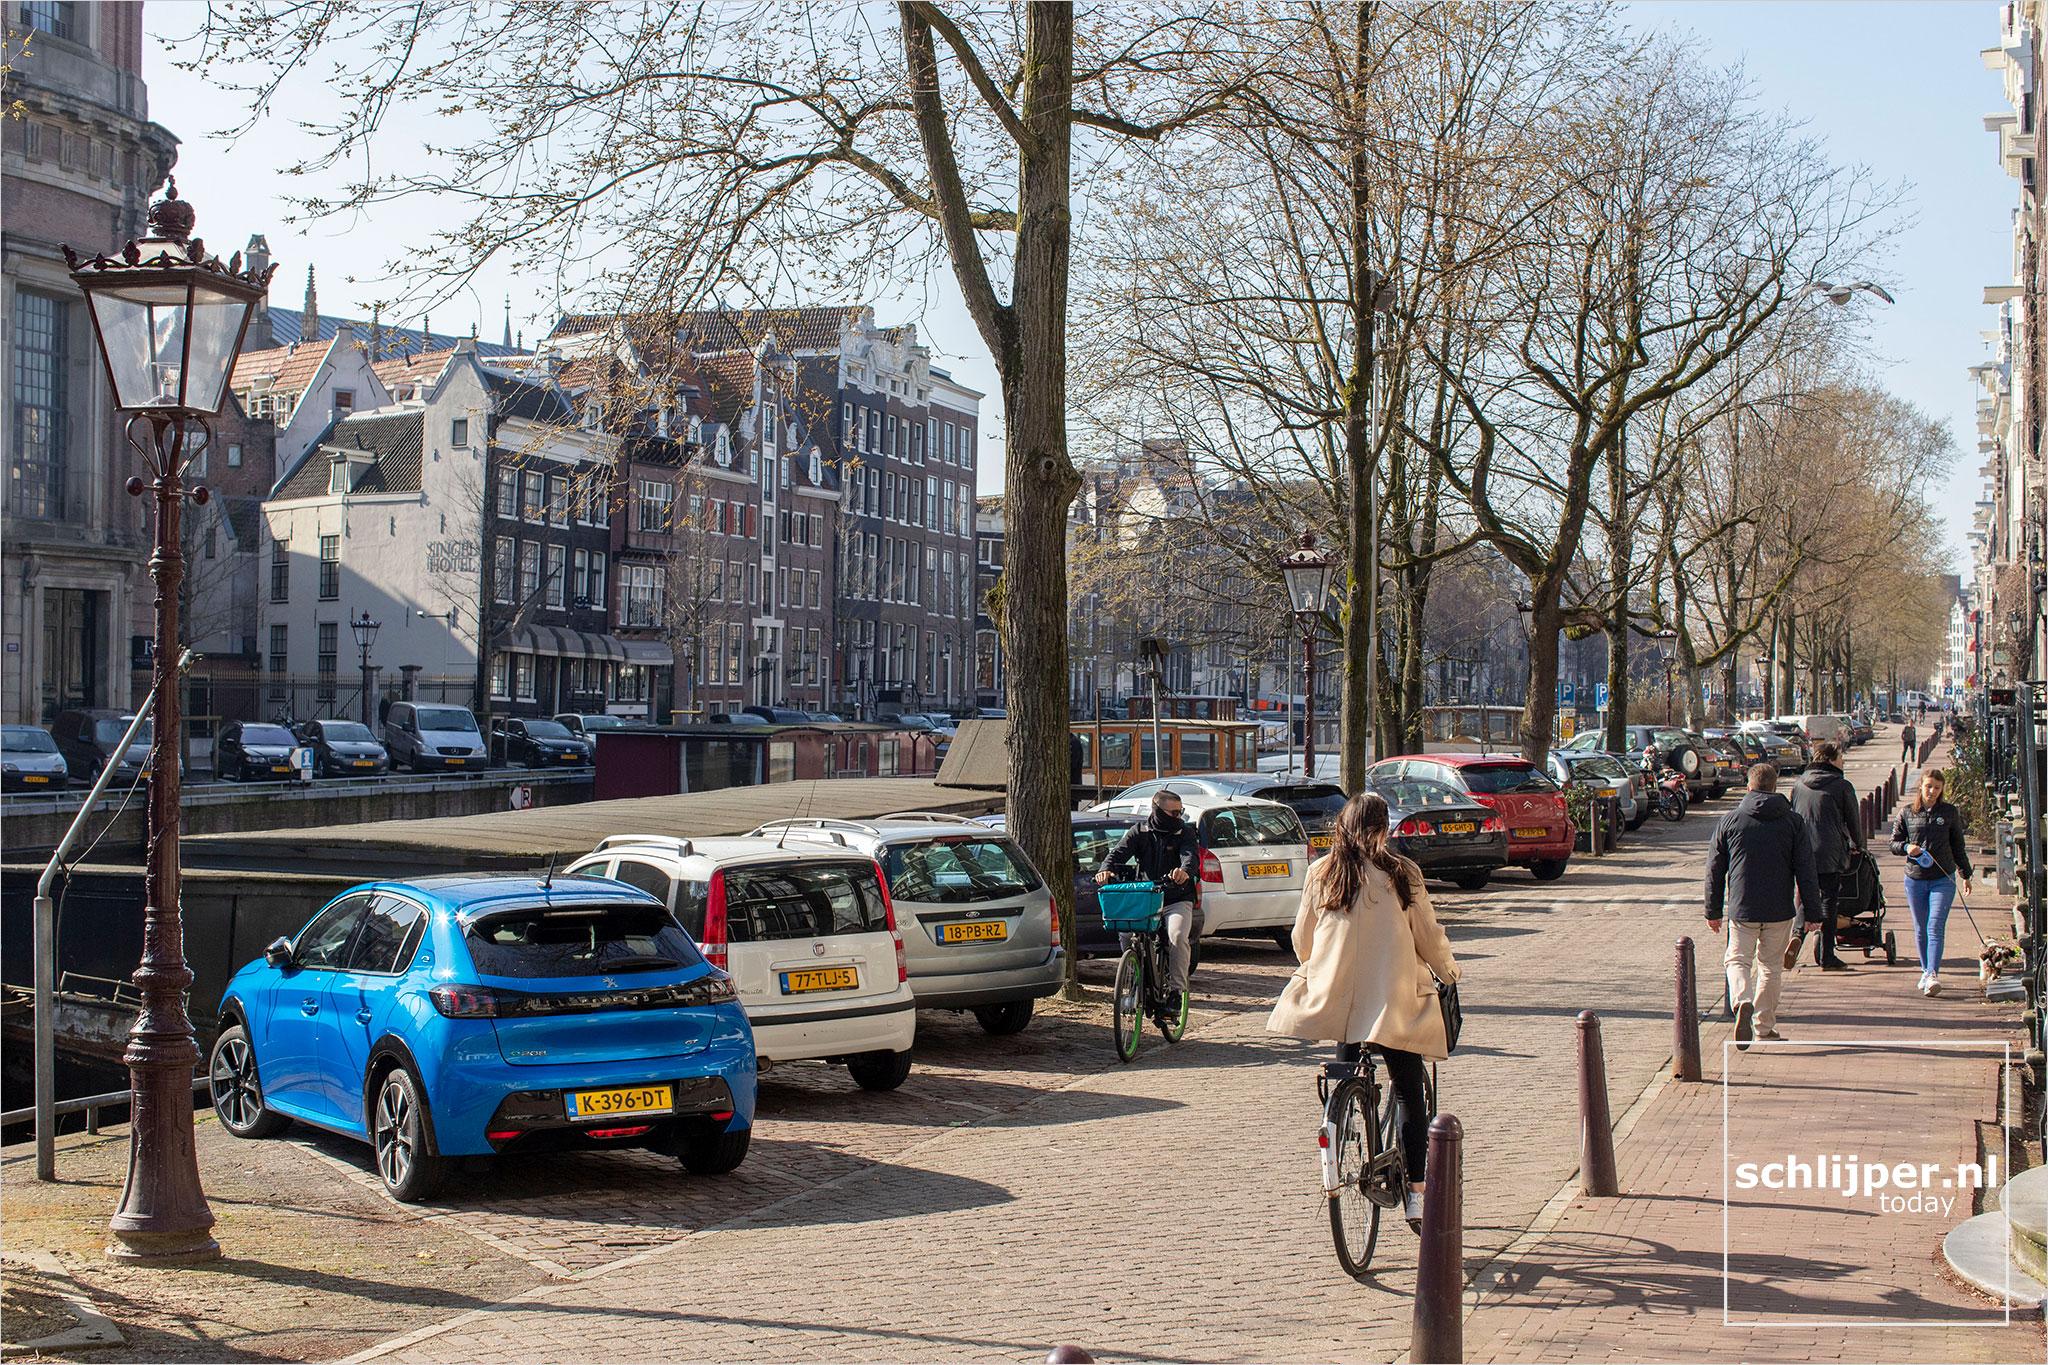 The Netherlands, Amsterdam, 26 maart 2021